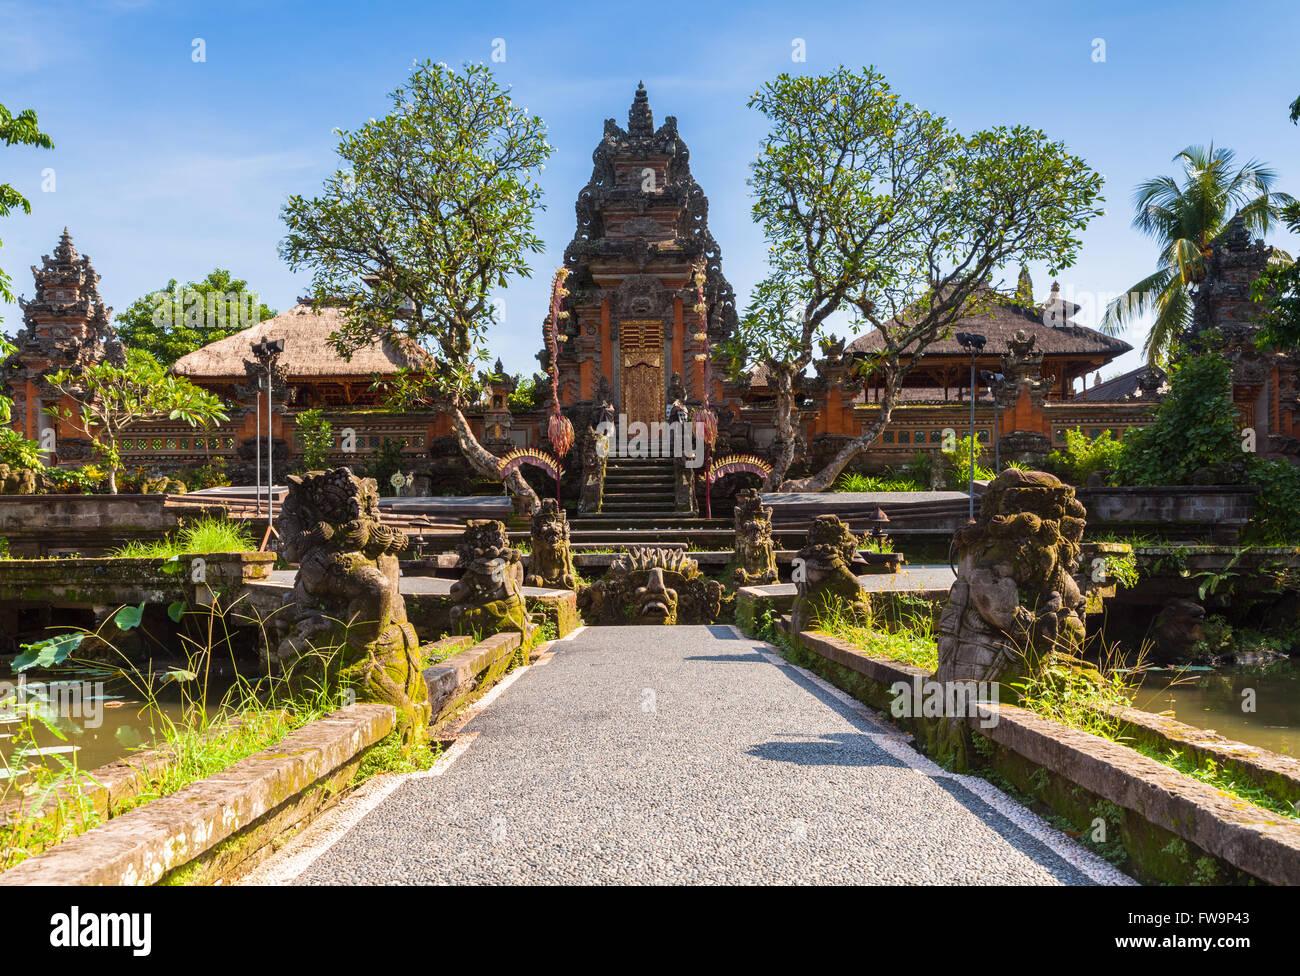 Pura Saraswati Temple with beatiful lotus pond, Ubud, Bali, Indonesia - Stock Image